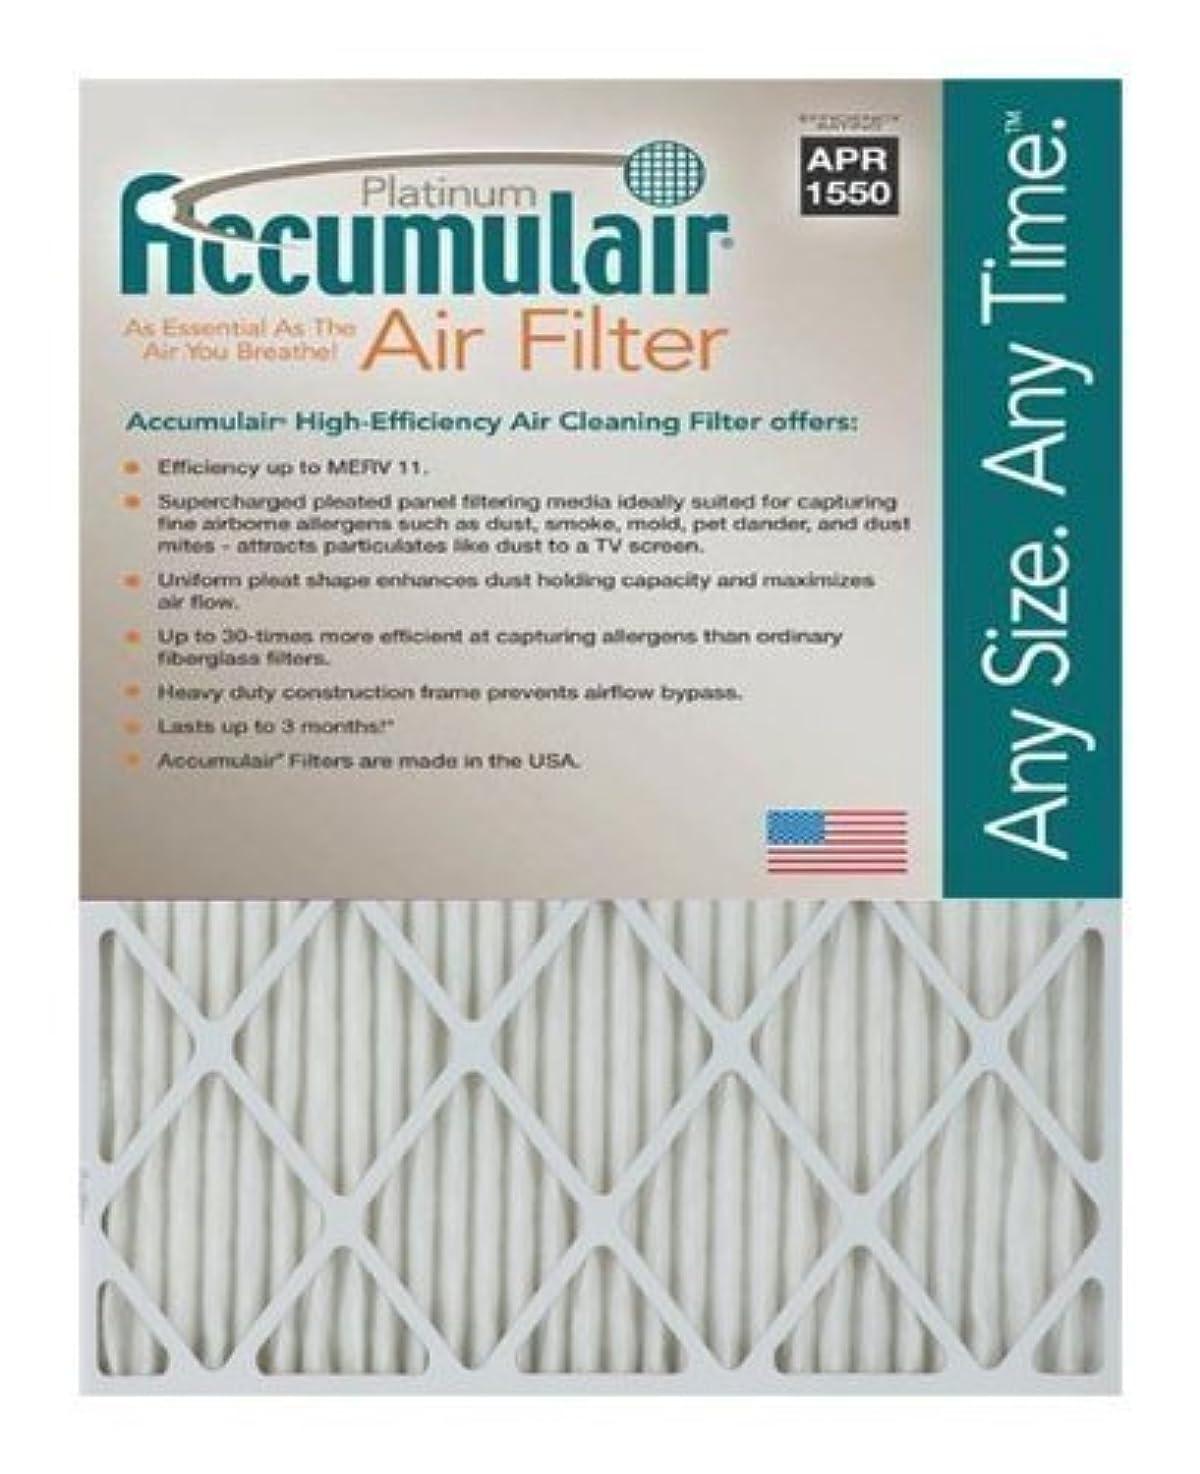 Accumulair Platinum 23x25x1 (Actual Size) MERV 11 Air Filter/Furnace Filters (6 pack)